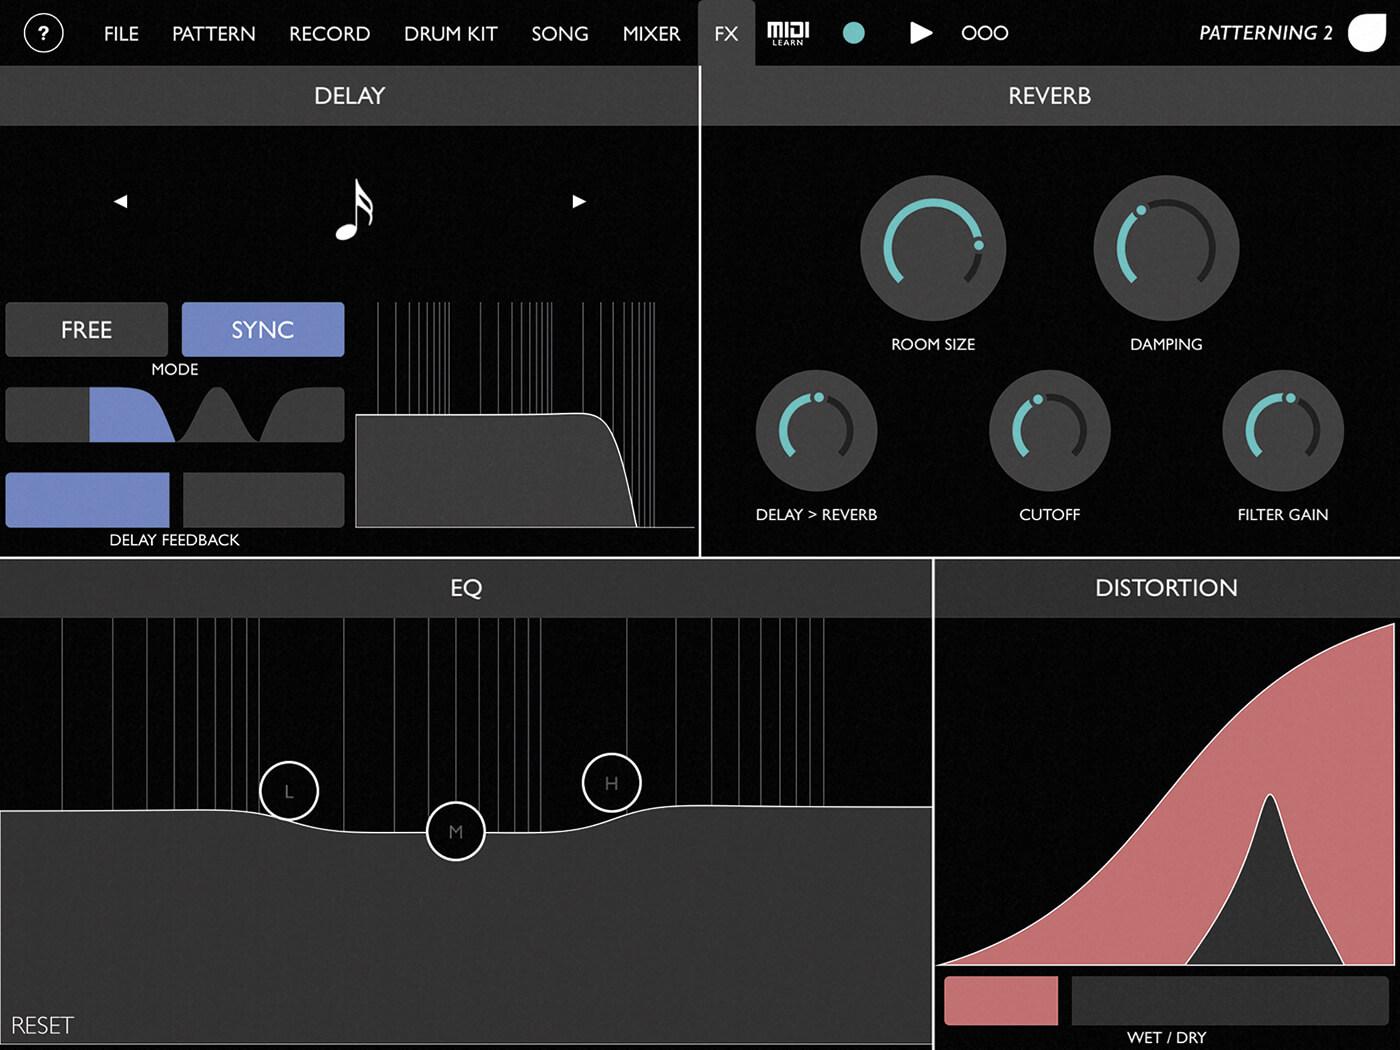 Olympia Noise Co Patterning 2